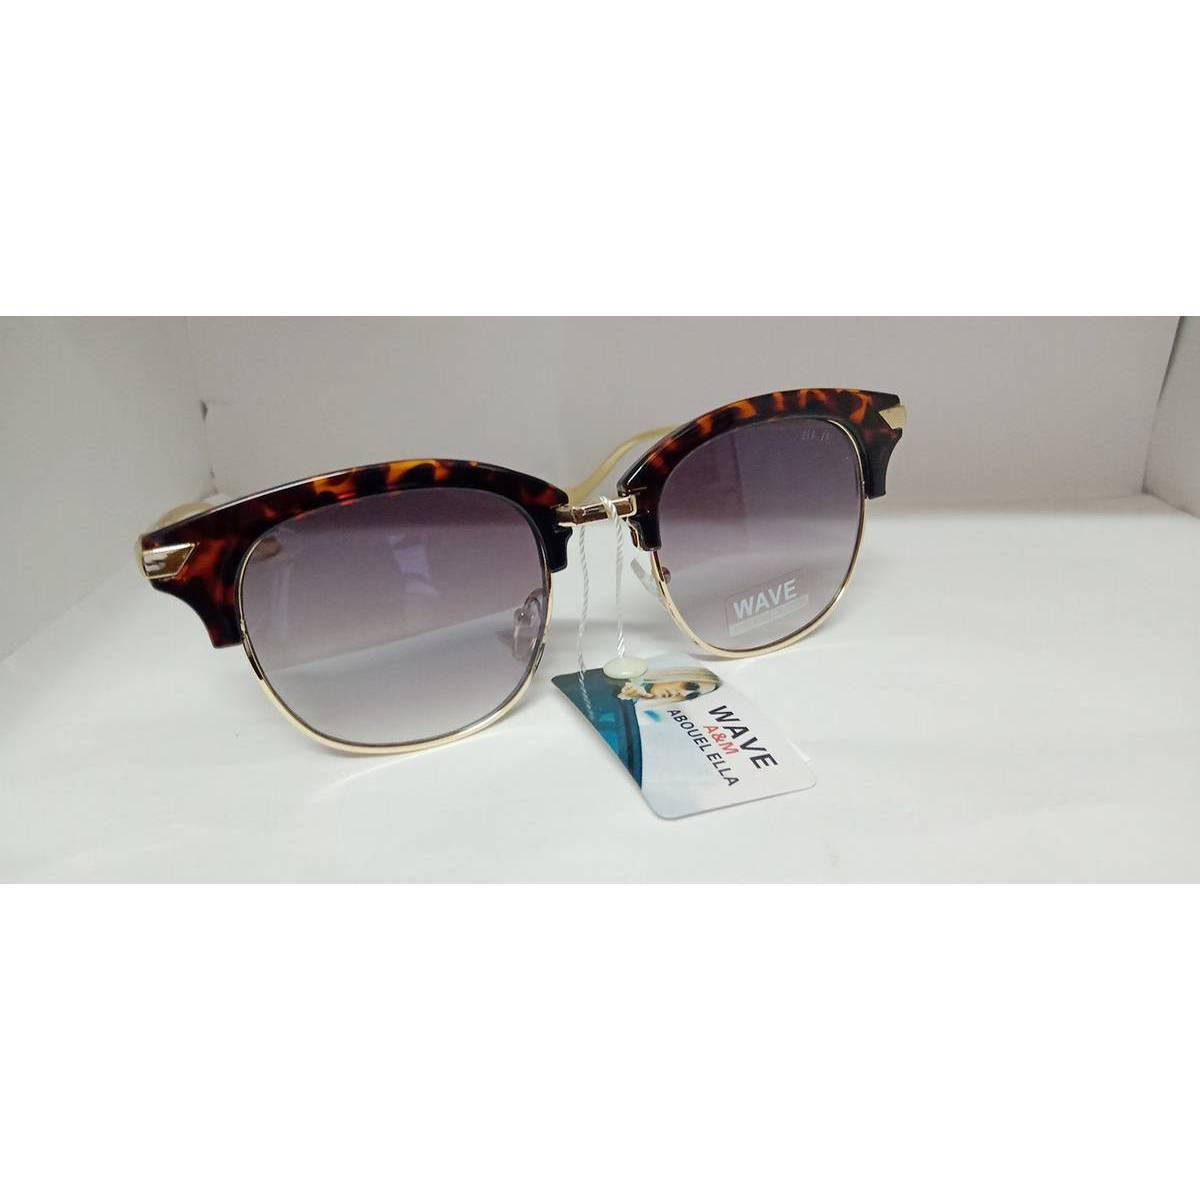 Sun Glasses Stylish And Fashion - Glasses With Box